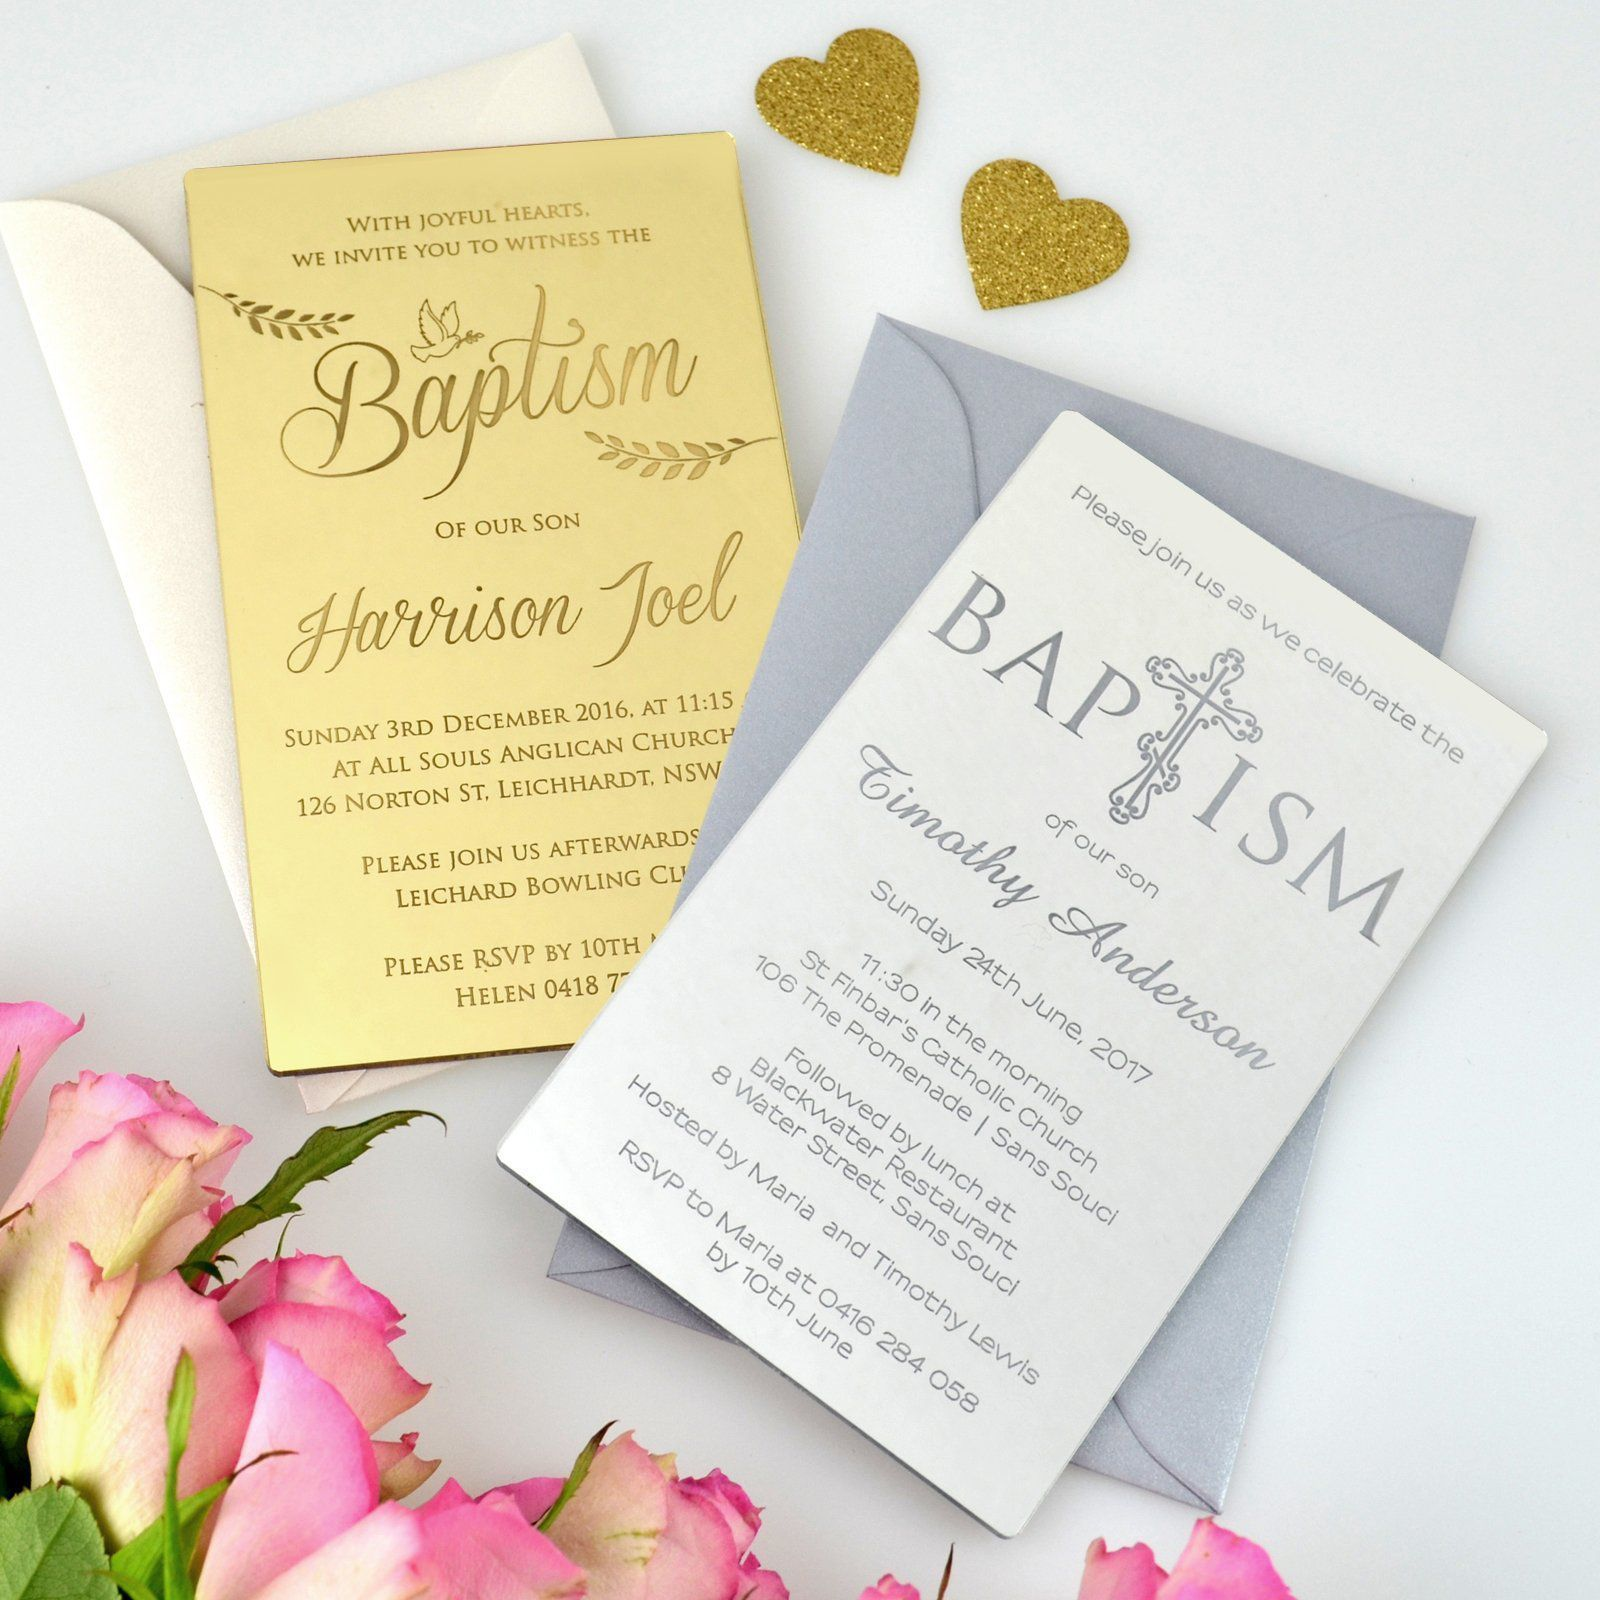 baptism invitation : cheap baptism invitations - Free Invitation for ...